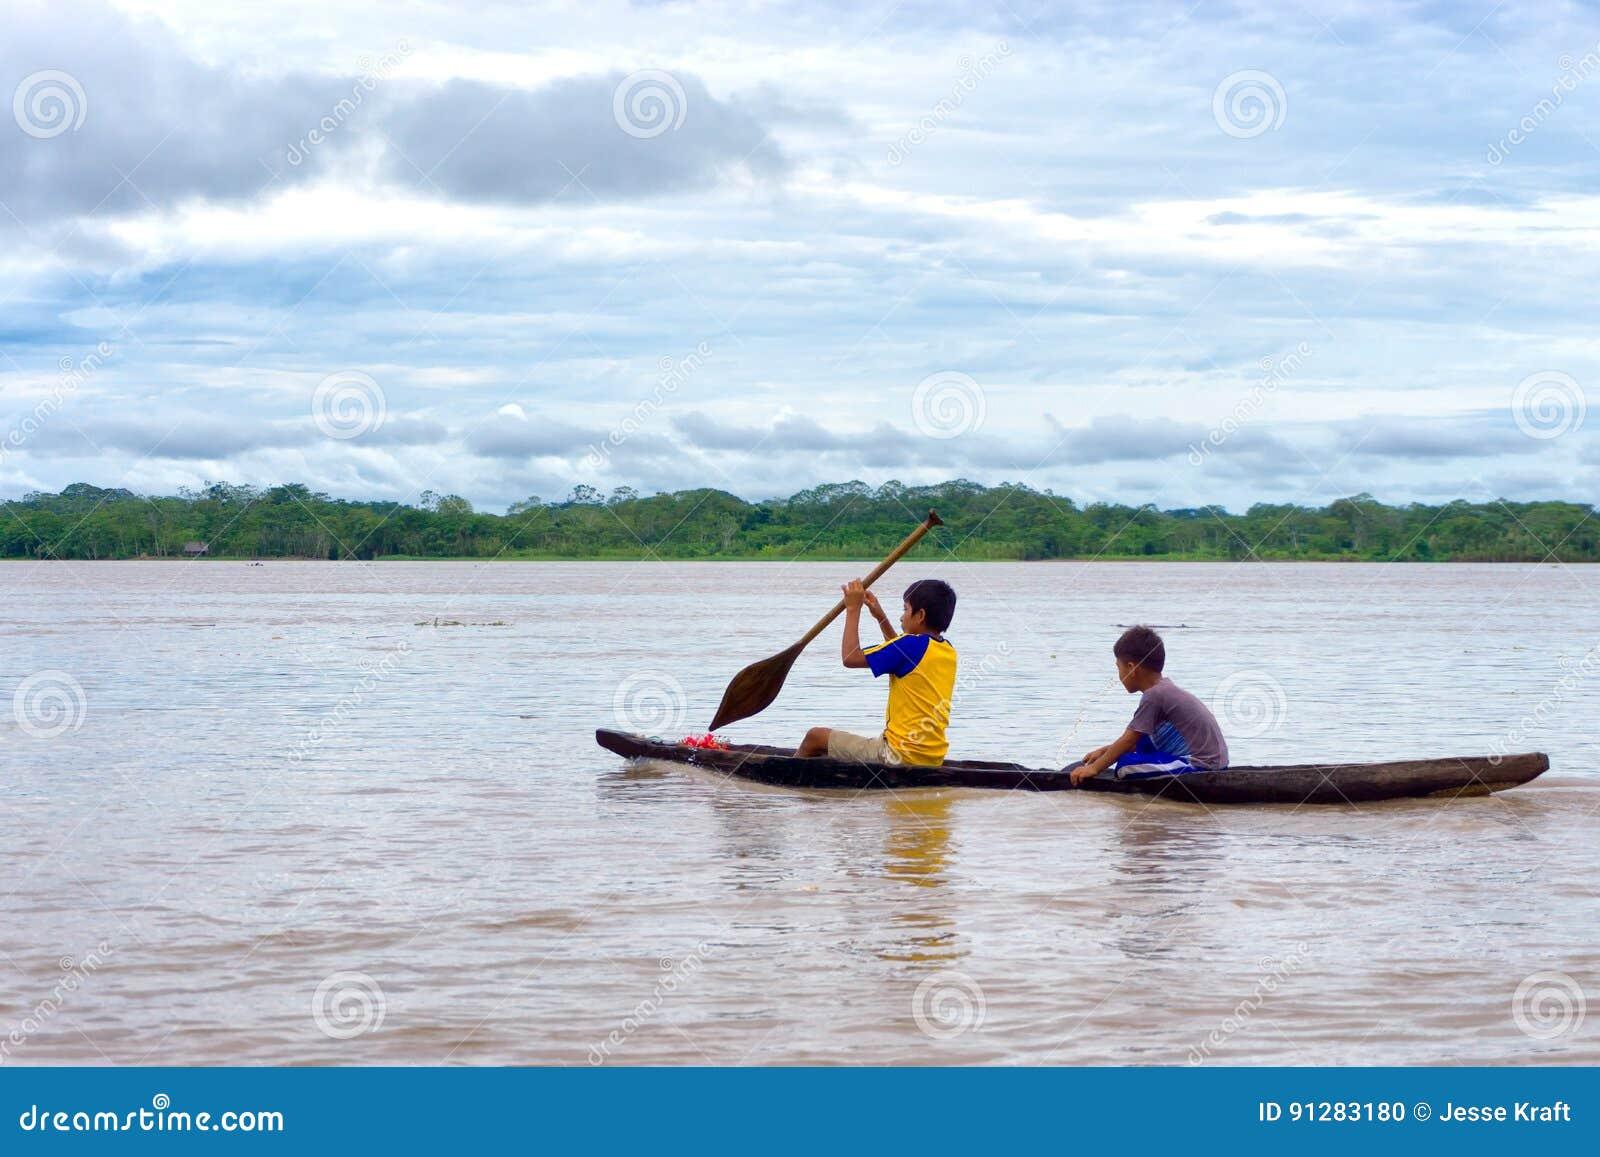 Barn i en Dugoutkanot